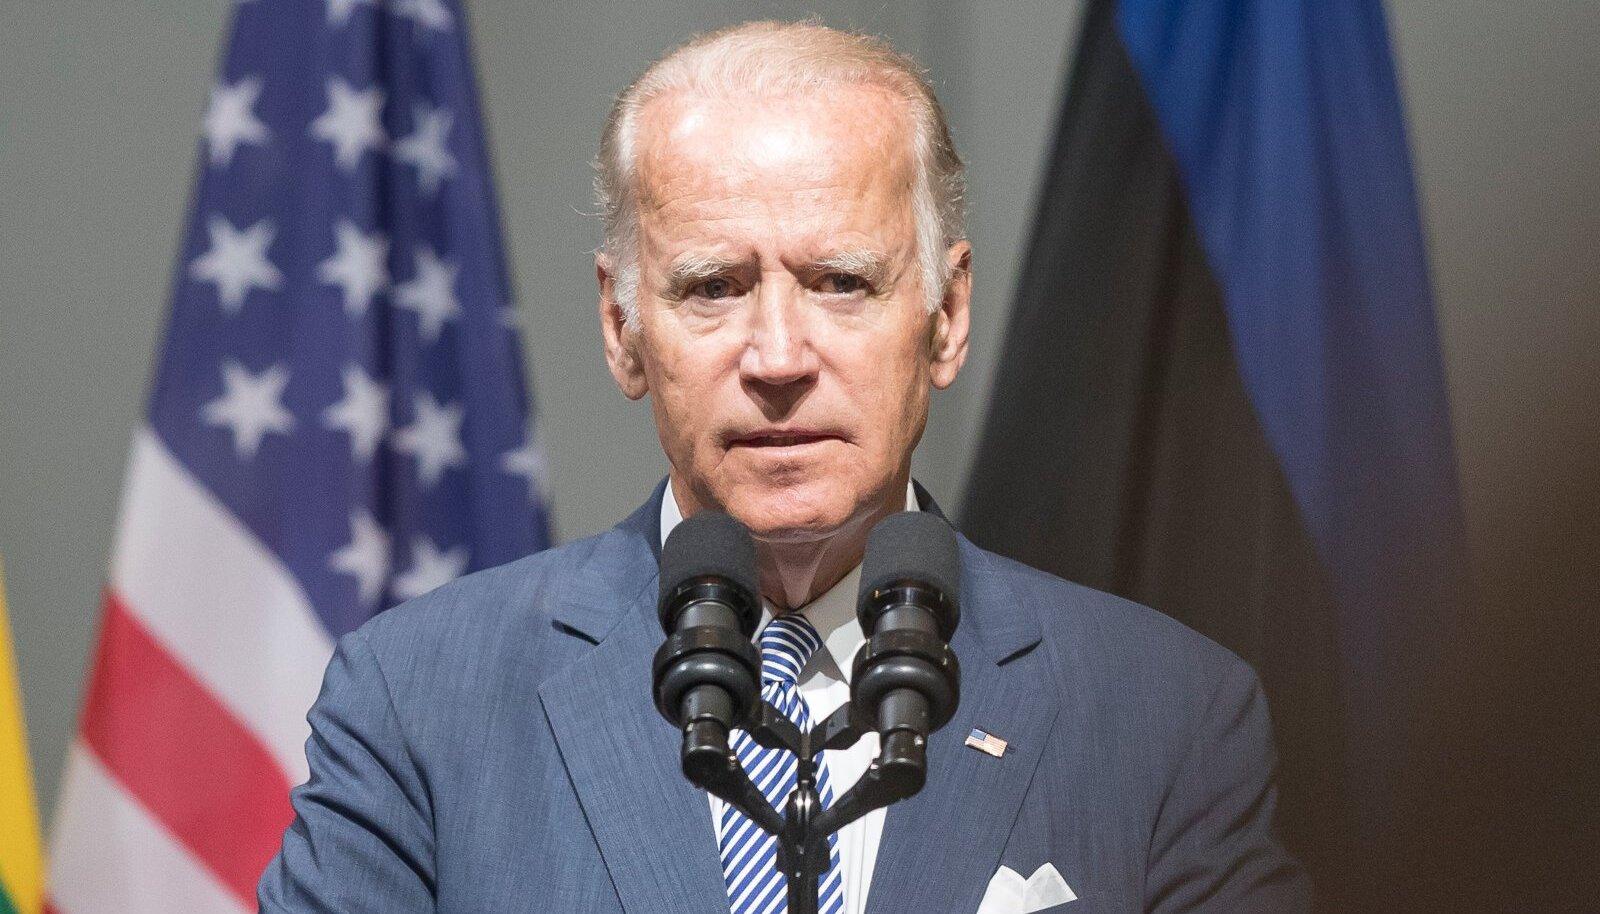 USA asepresident Joe Biden Riias